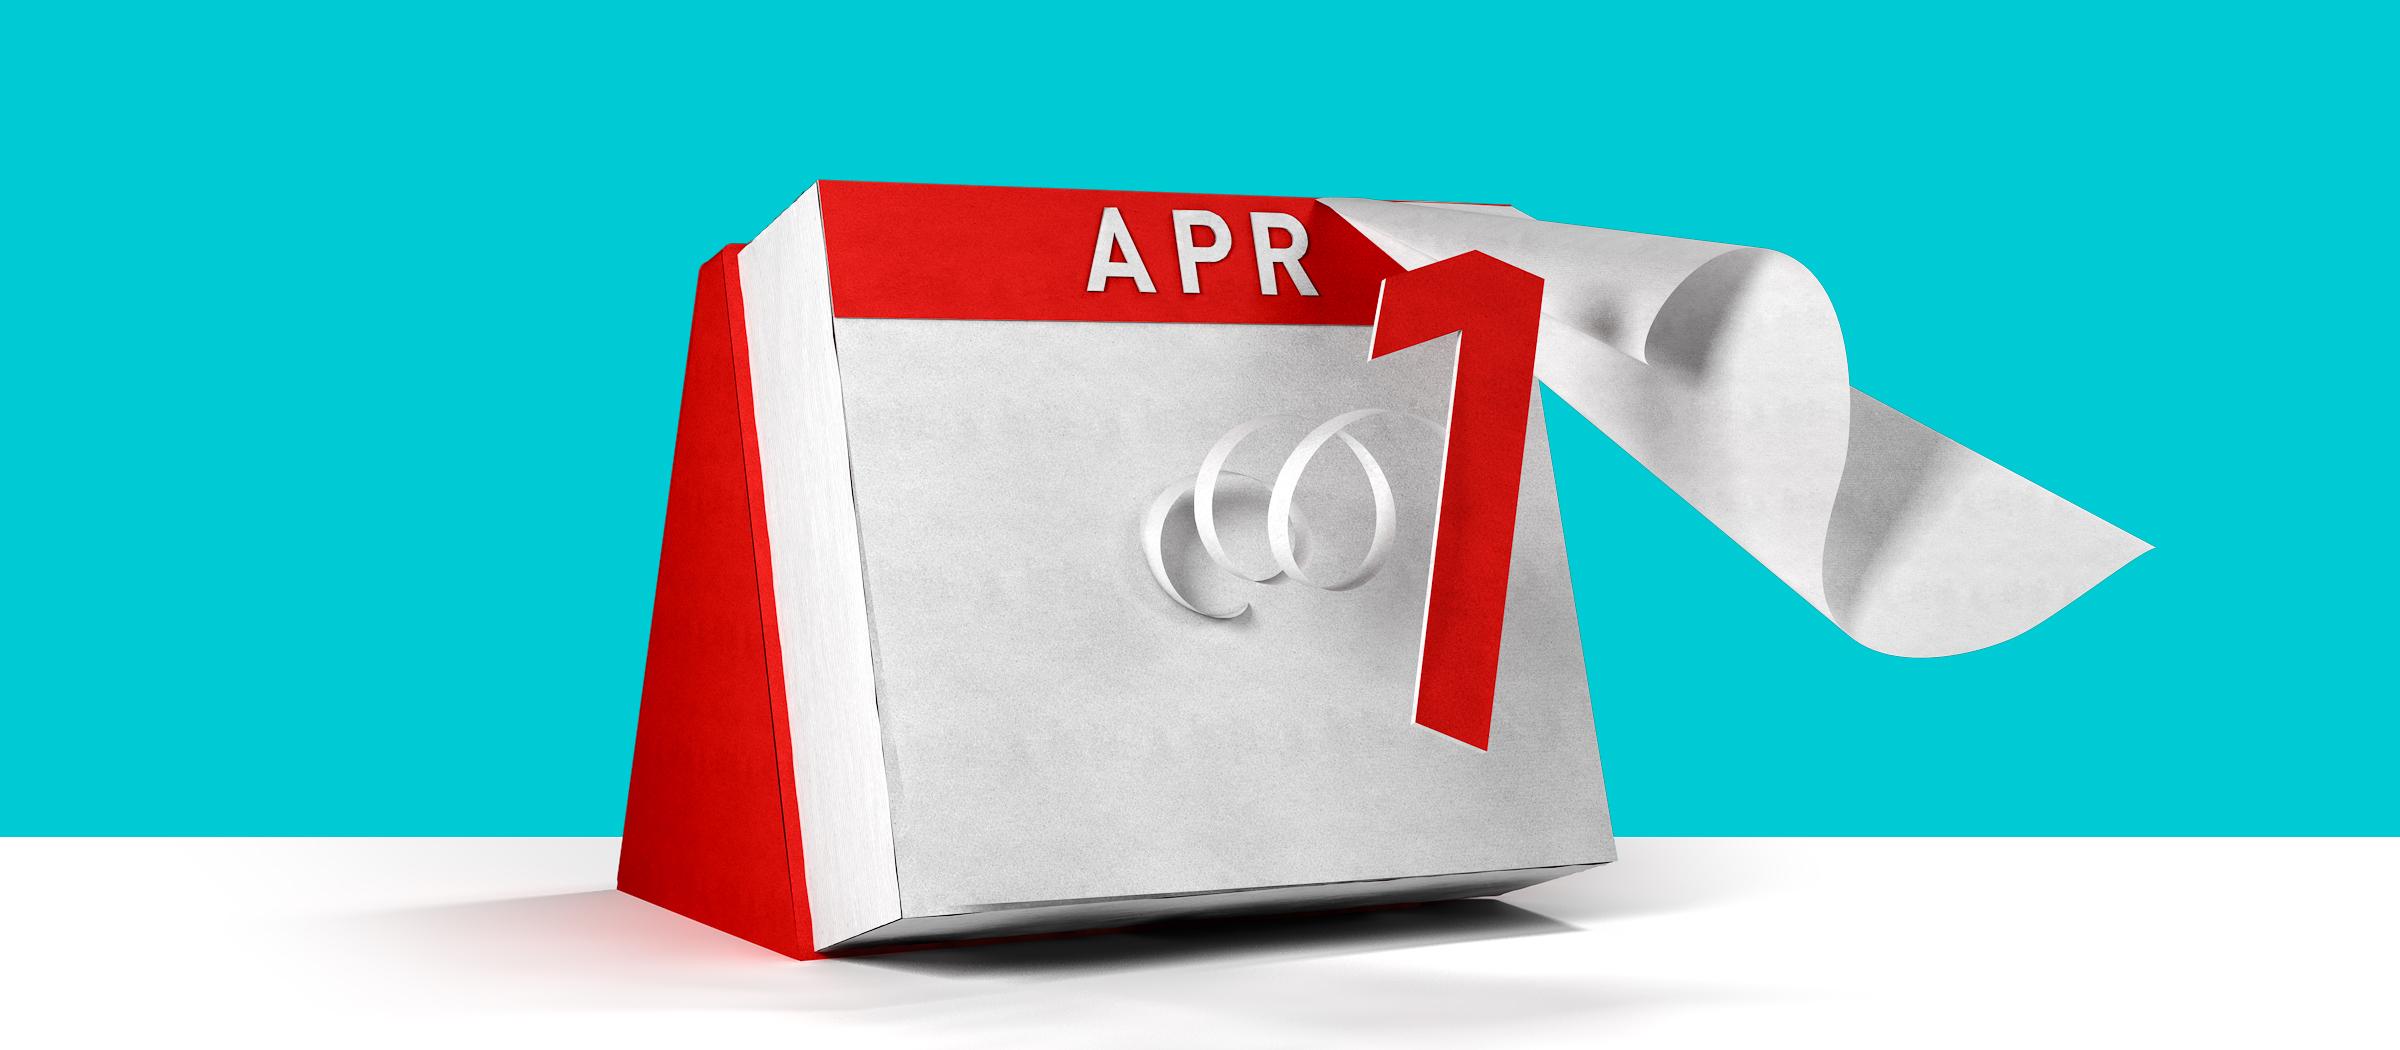 FACE_AprilFools_Calendar_Comp.jpg